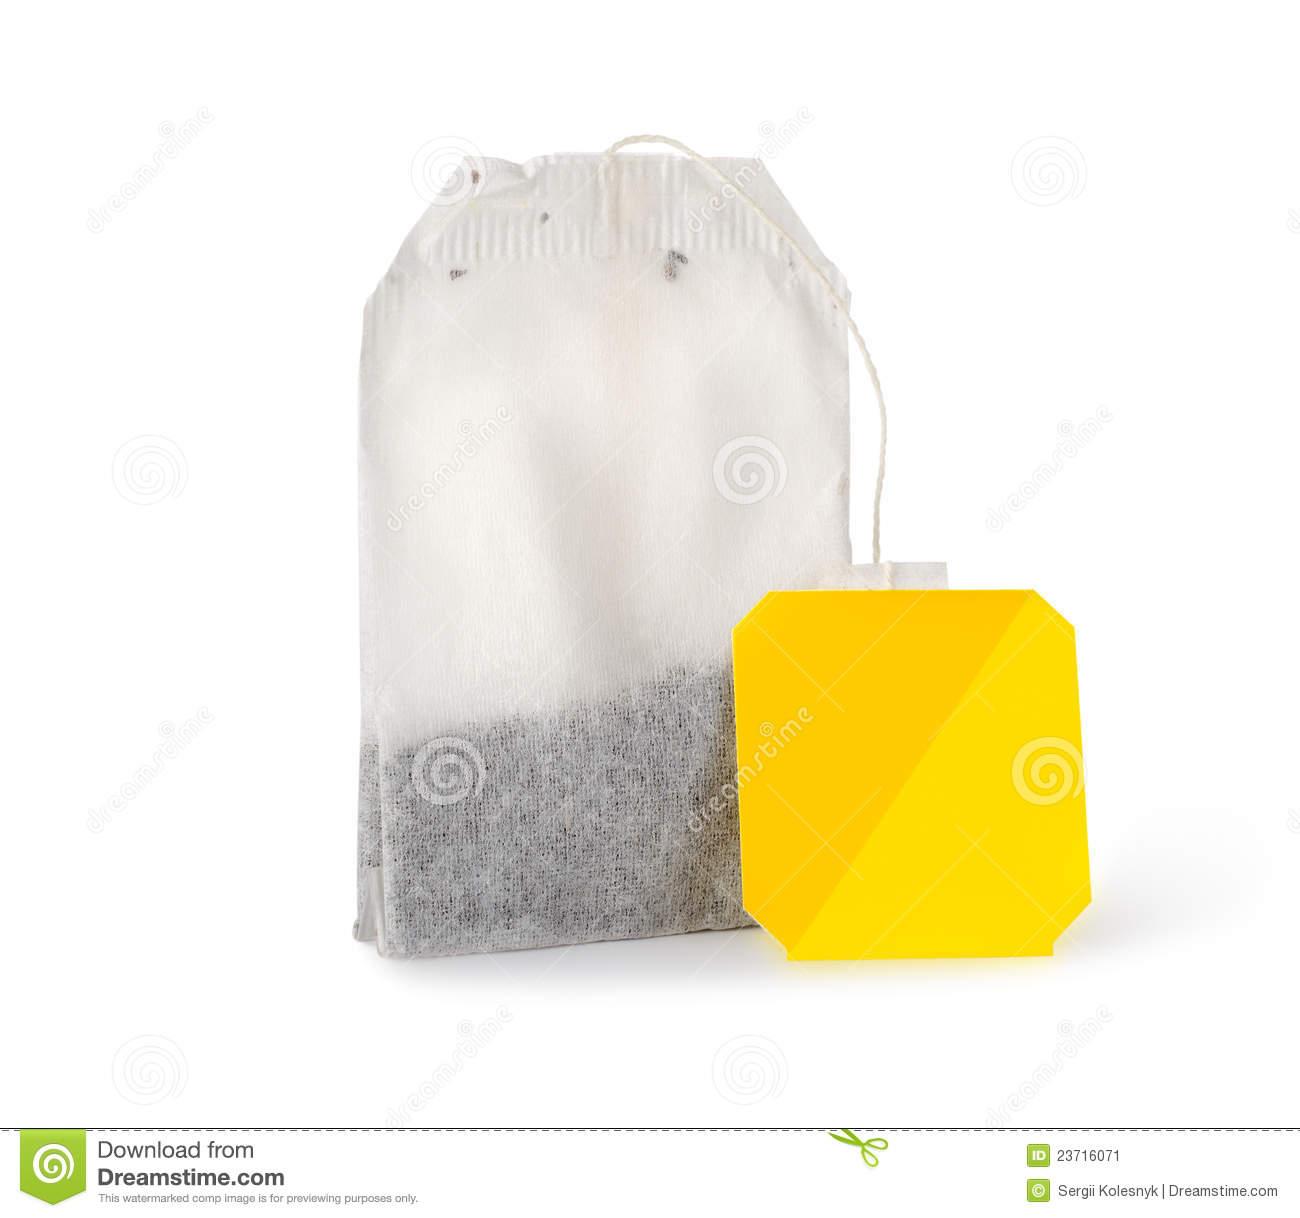 Tea Bag Clipart - Clipart Suggest